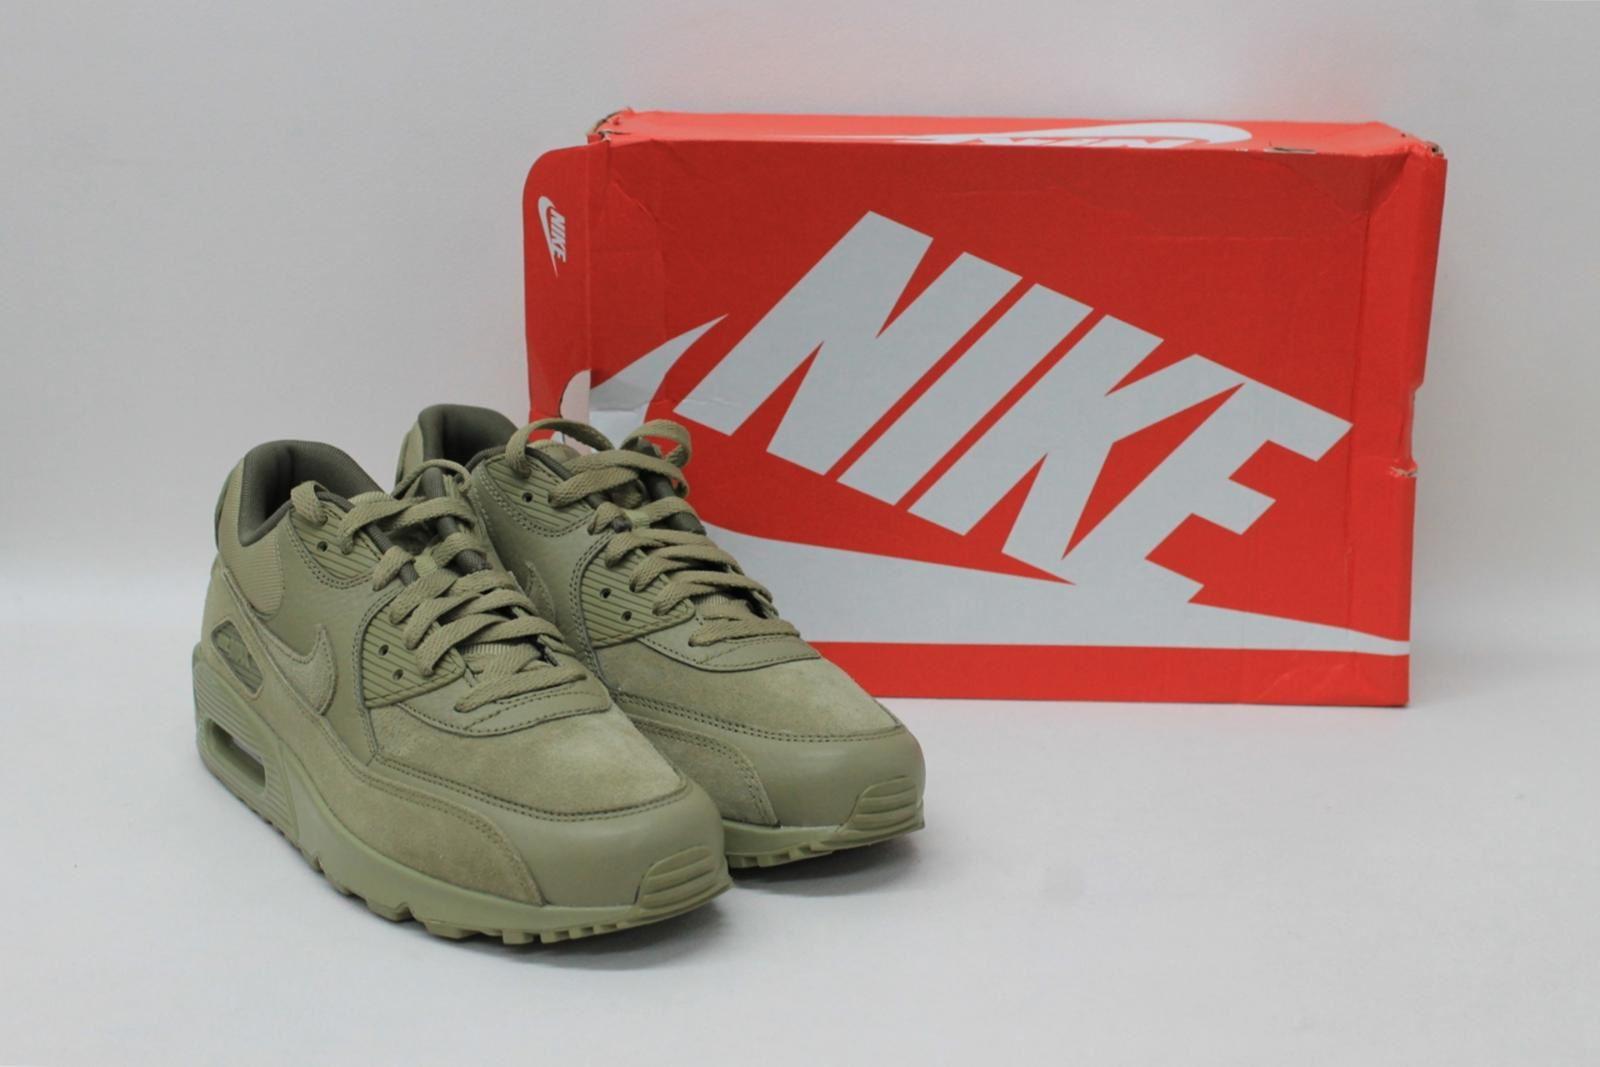 kaki Scarpe Nike Air da verdi Max Premium stringate Eu42 Uk8 taglia Uomo Bnib ginnastica 90 BqaWYYxv